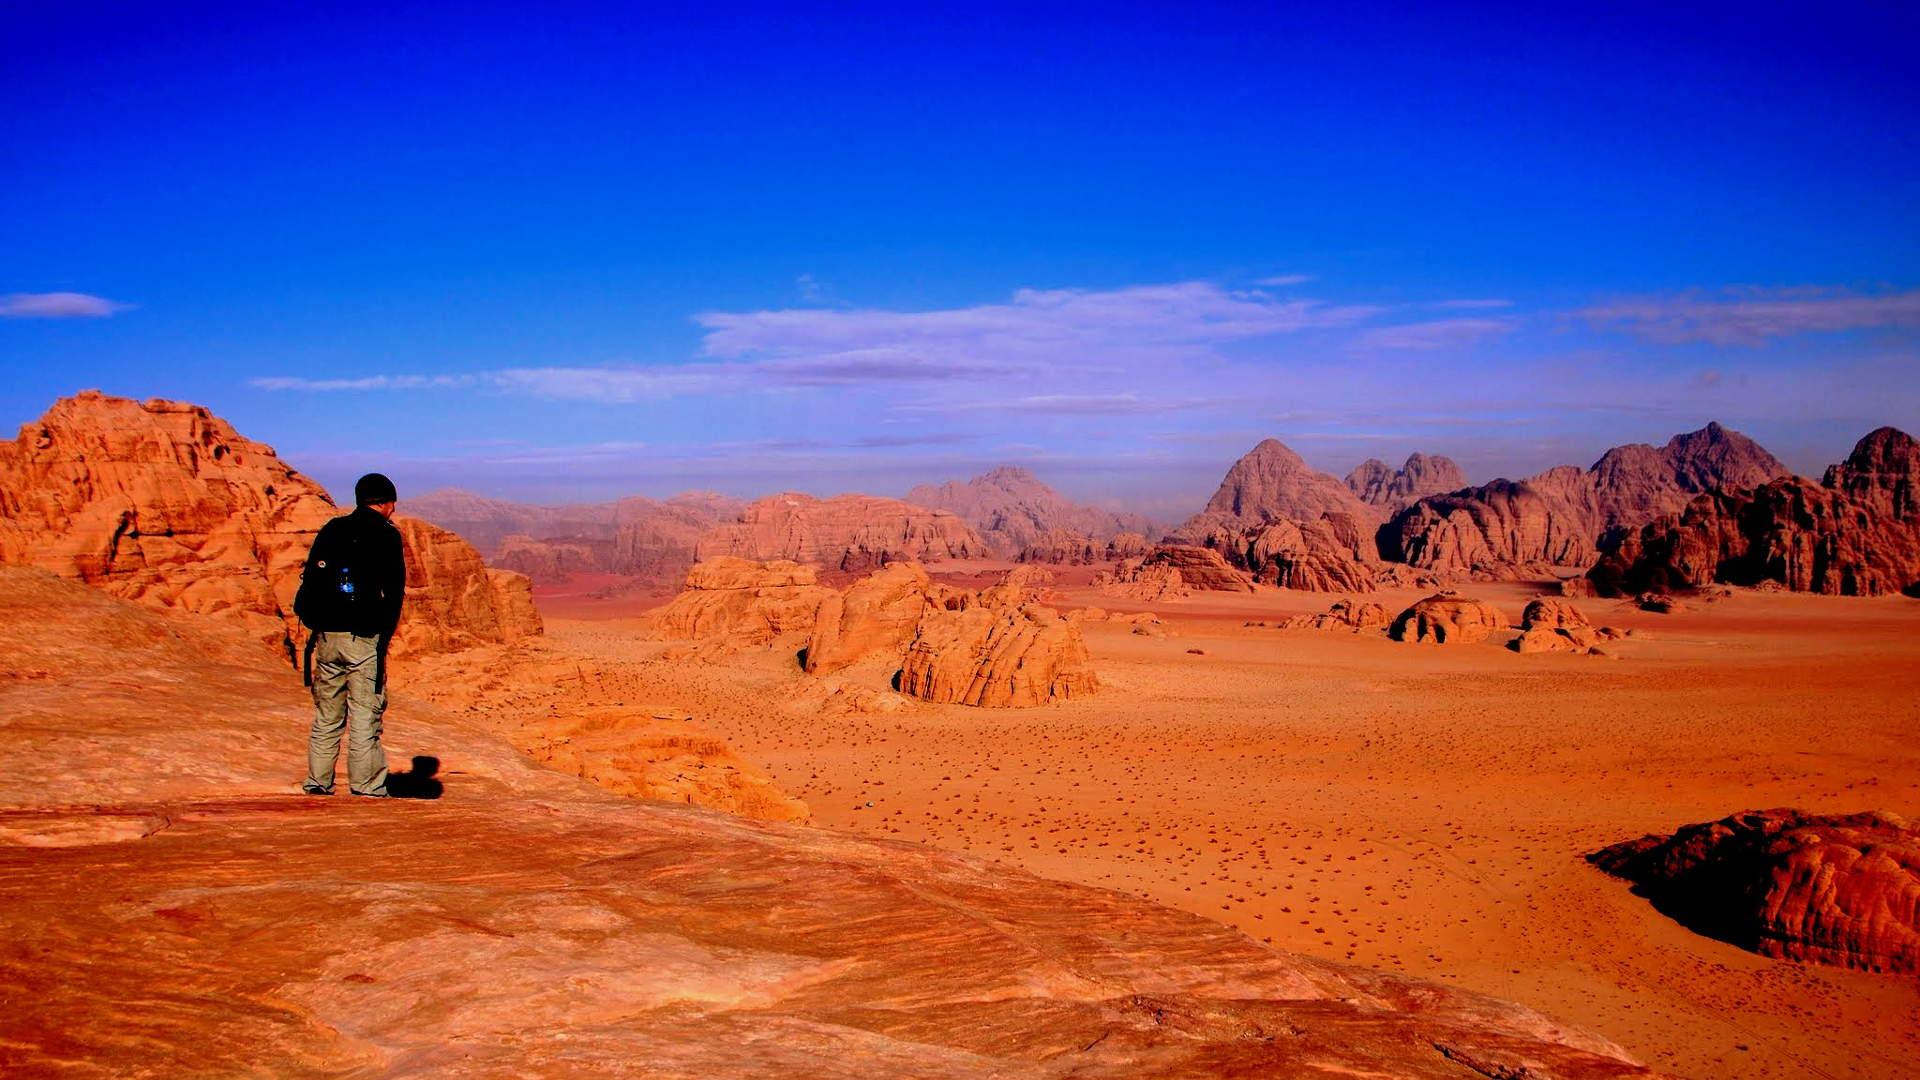 Petra Jordan Hd Wallpaper Wadi Rum Trek And Petra Trekking Holiday Terhaal